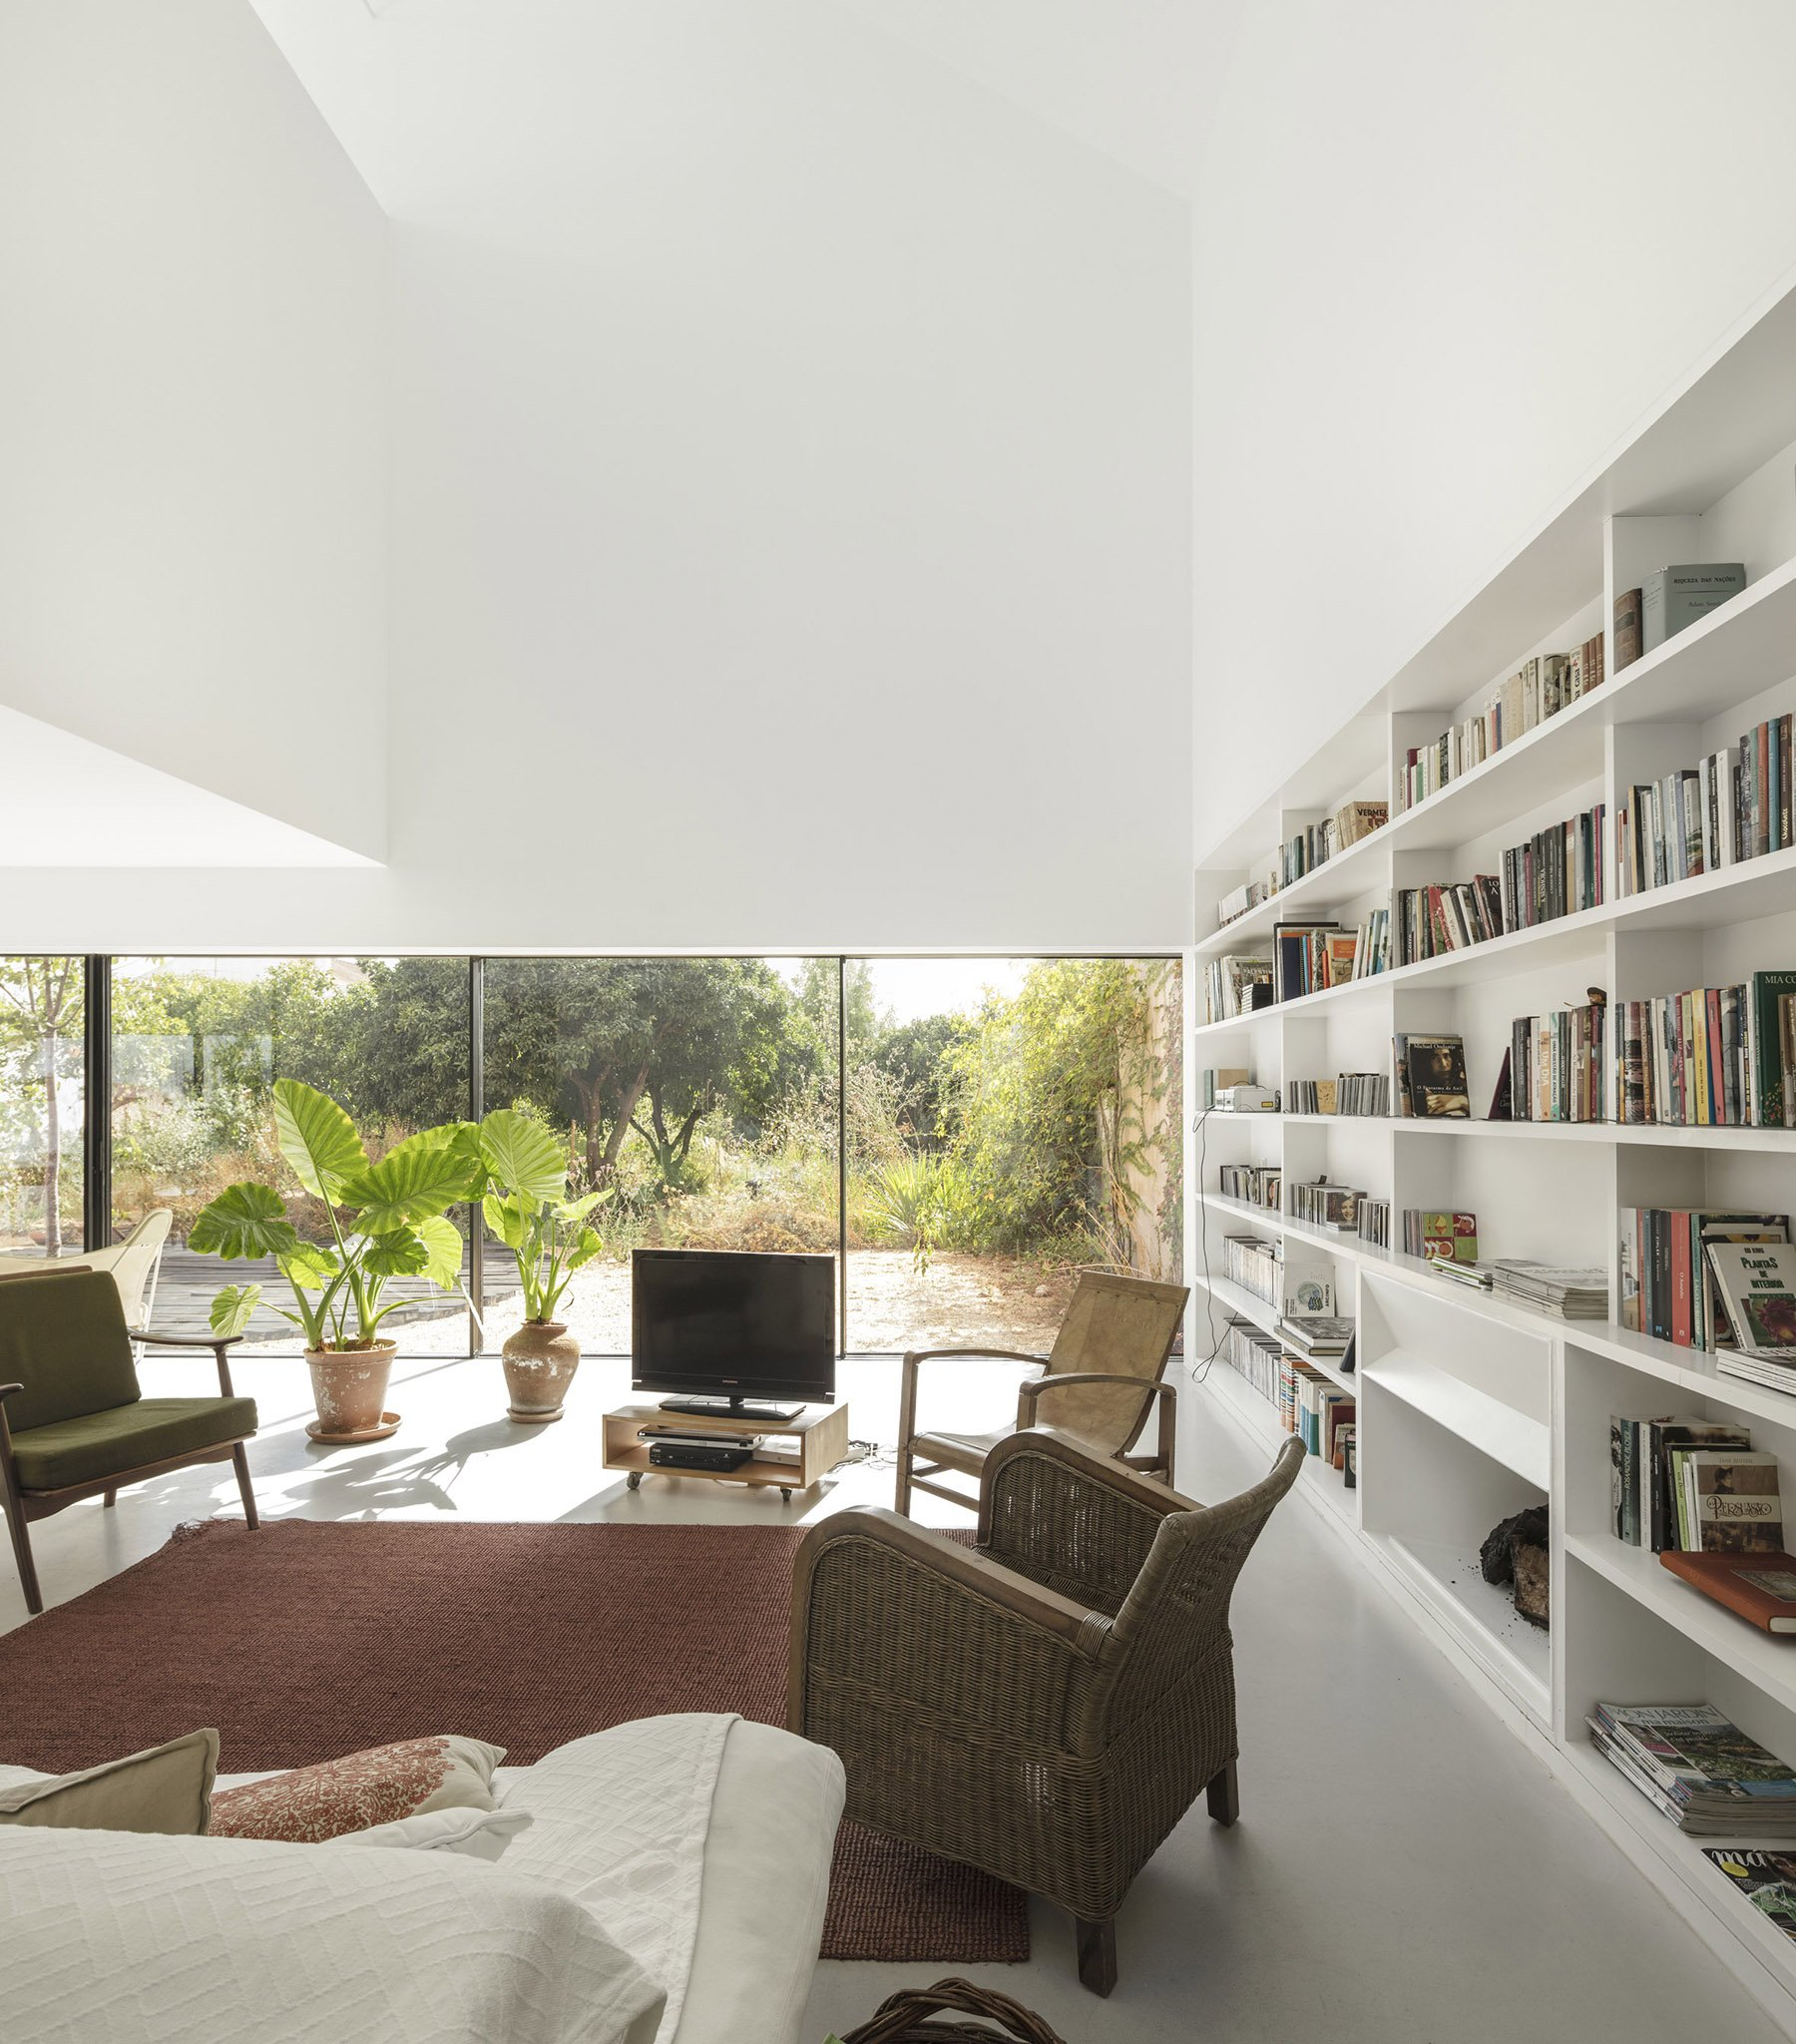 iGNANT-Architecture-ExtraStudio-Converted-Winery-006